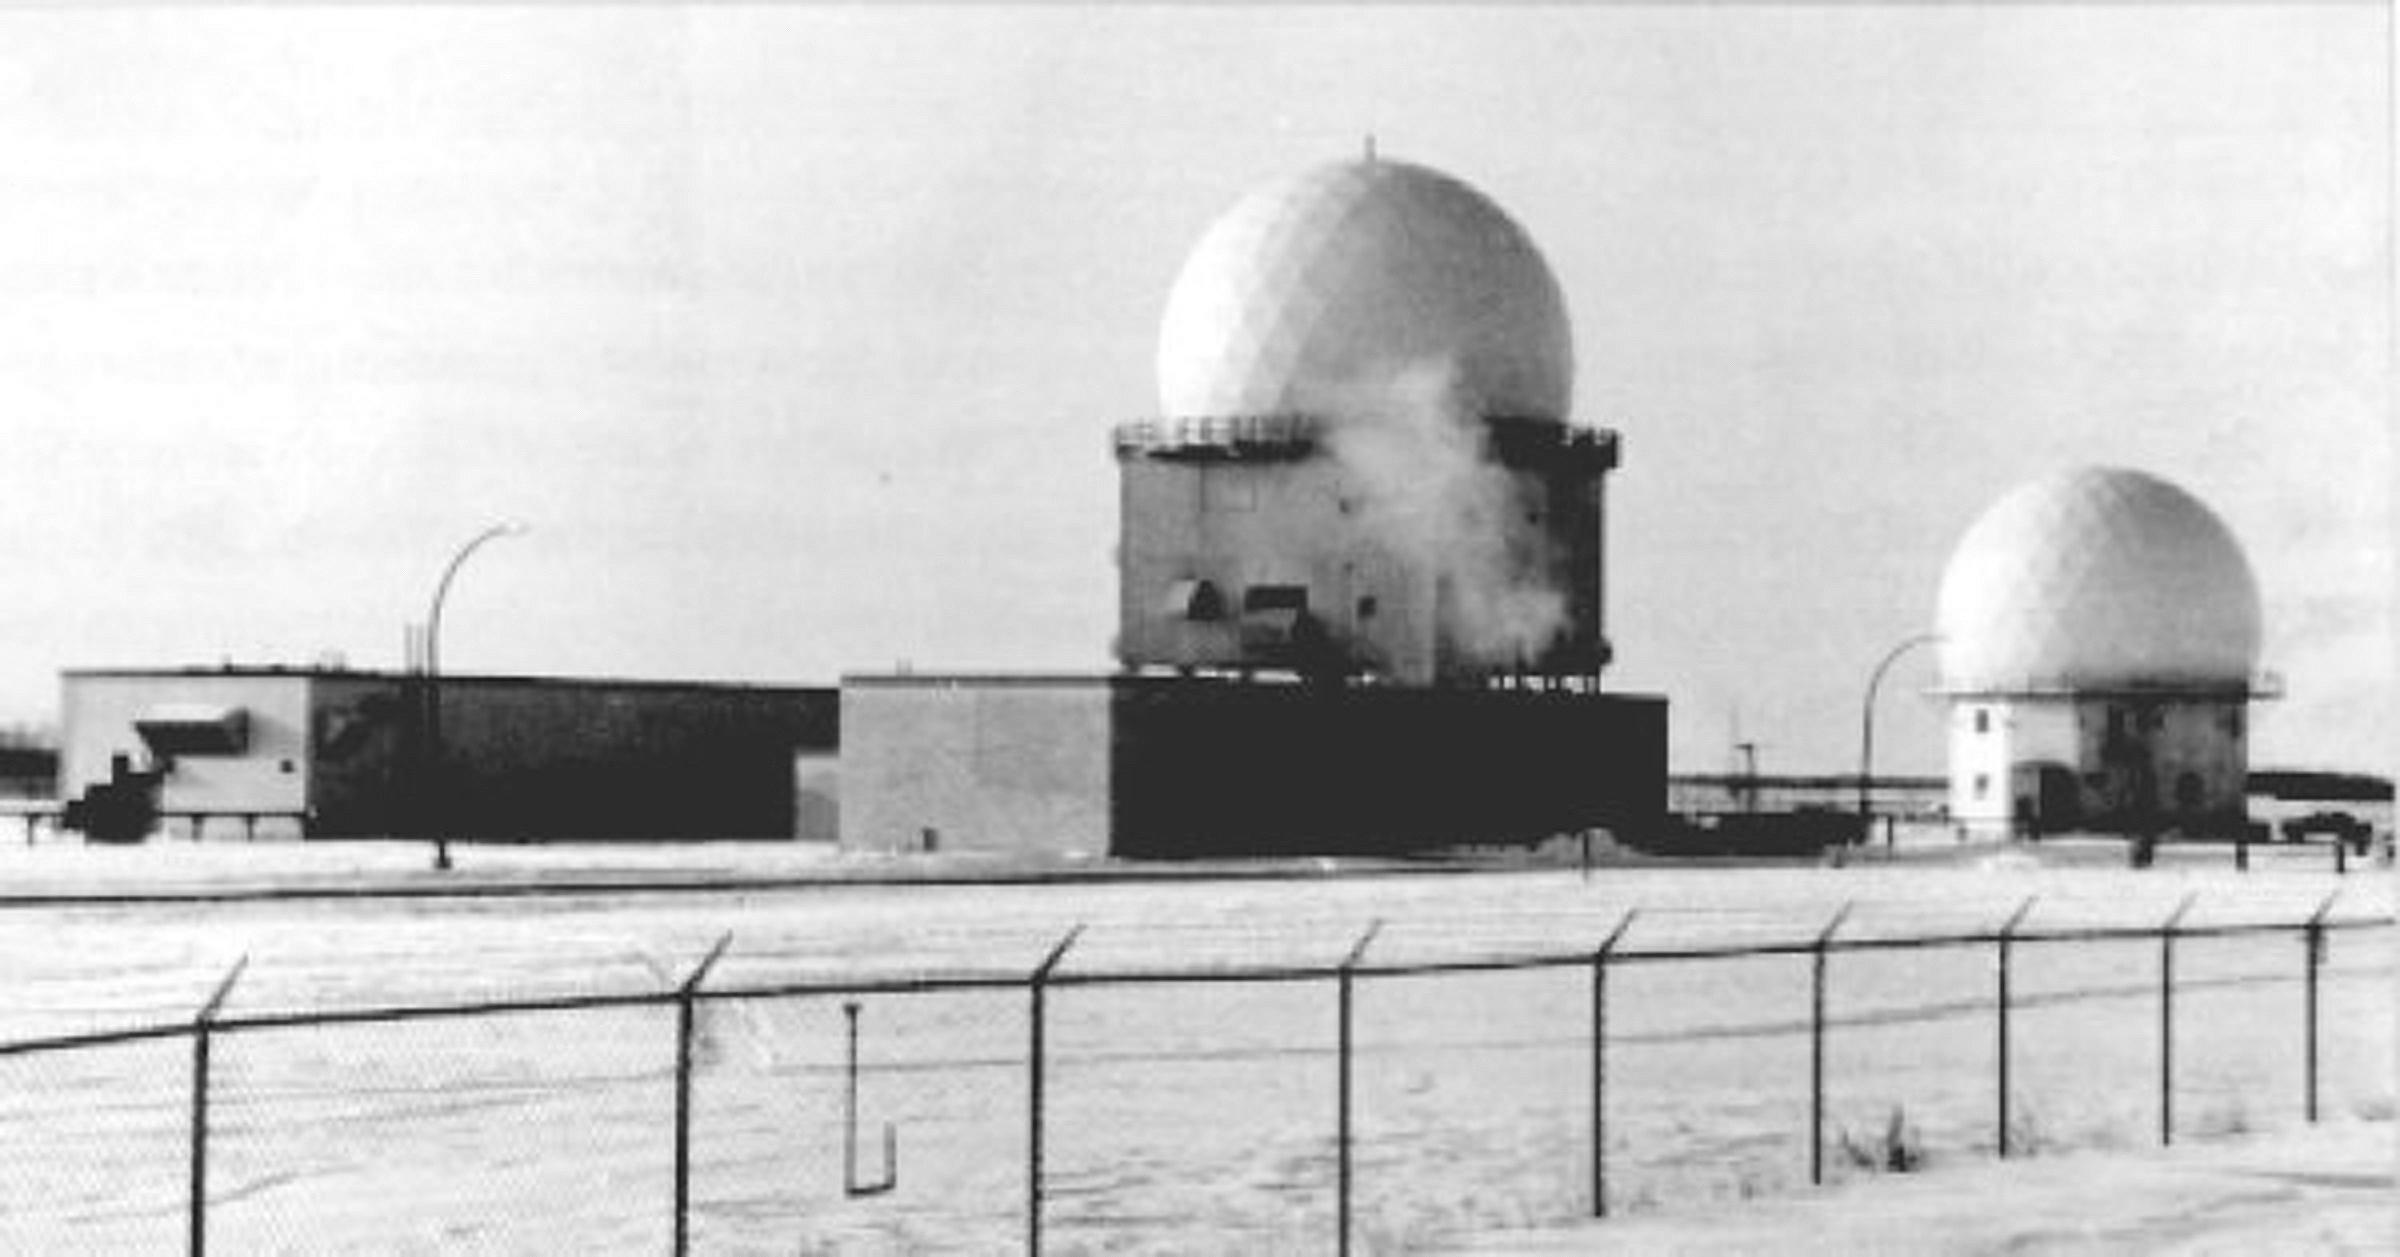 Yorkton Sask. Radar towers in Operations site - November 1964